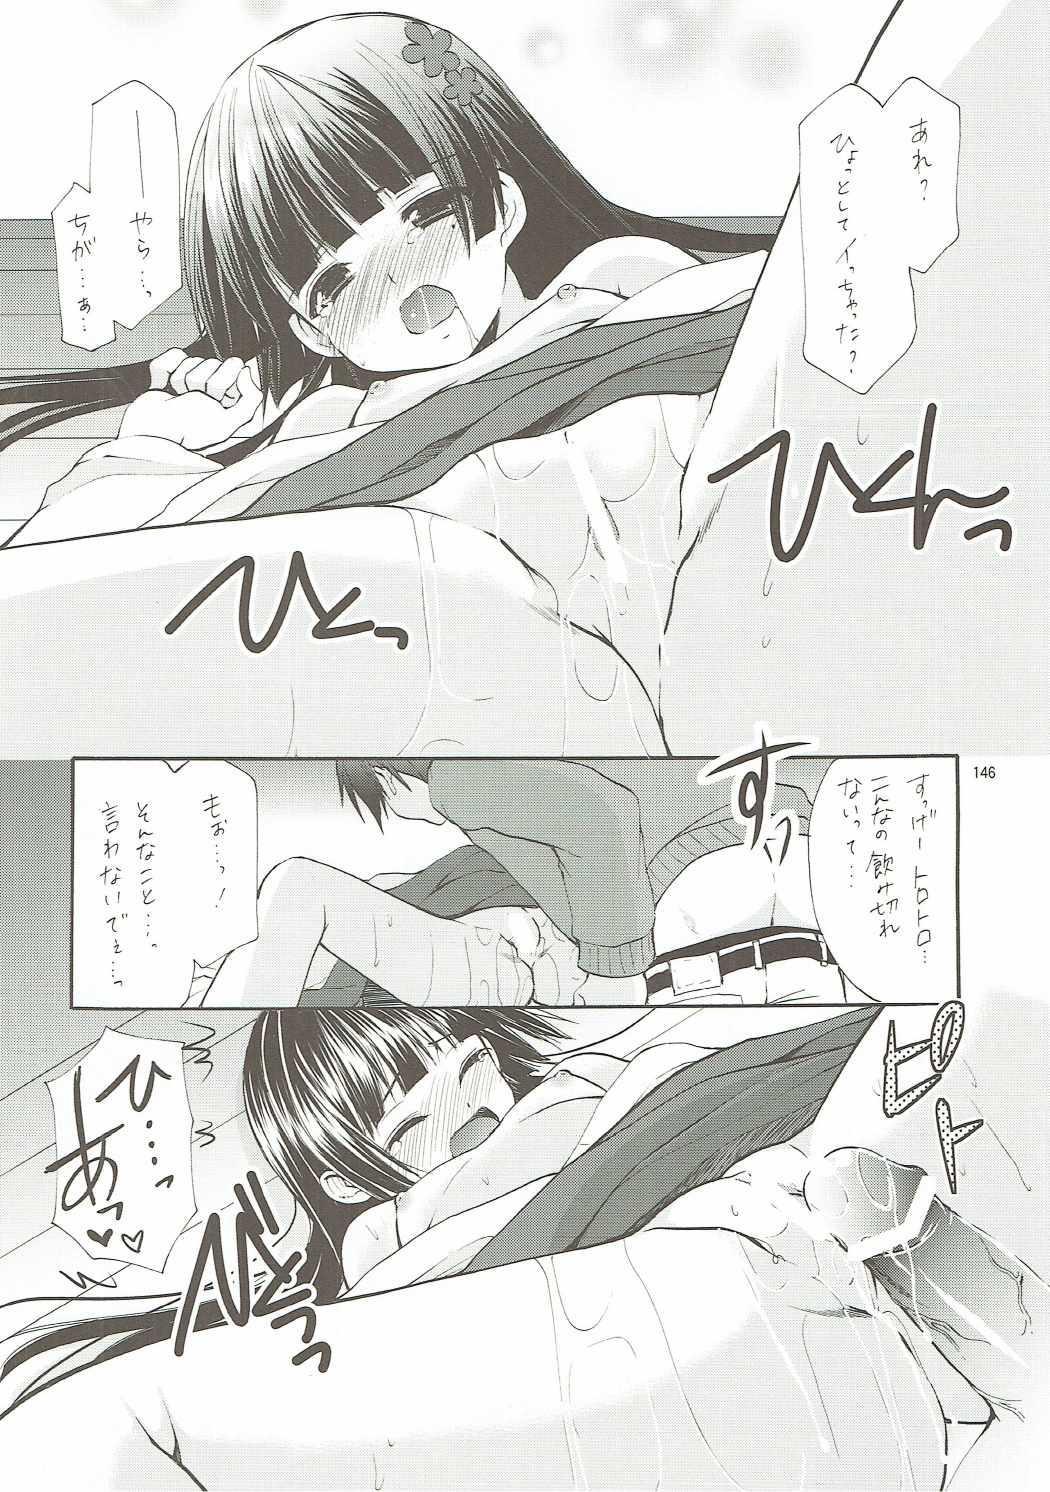 ANIME COLLECTION Imomuya Honpo - Singleton Anime Soushuuhen 144